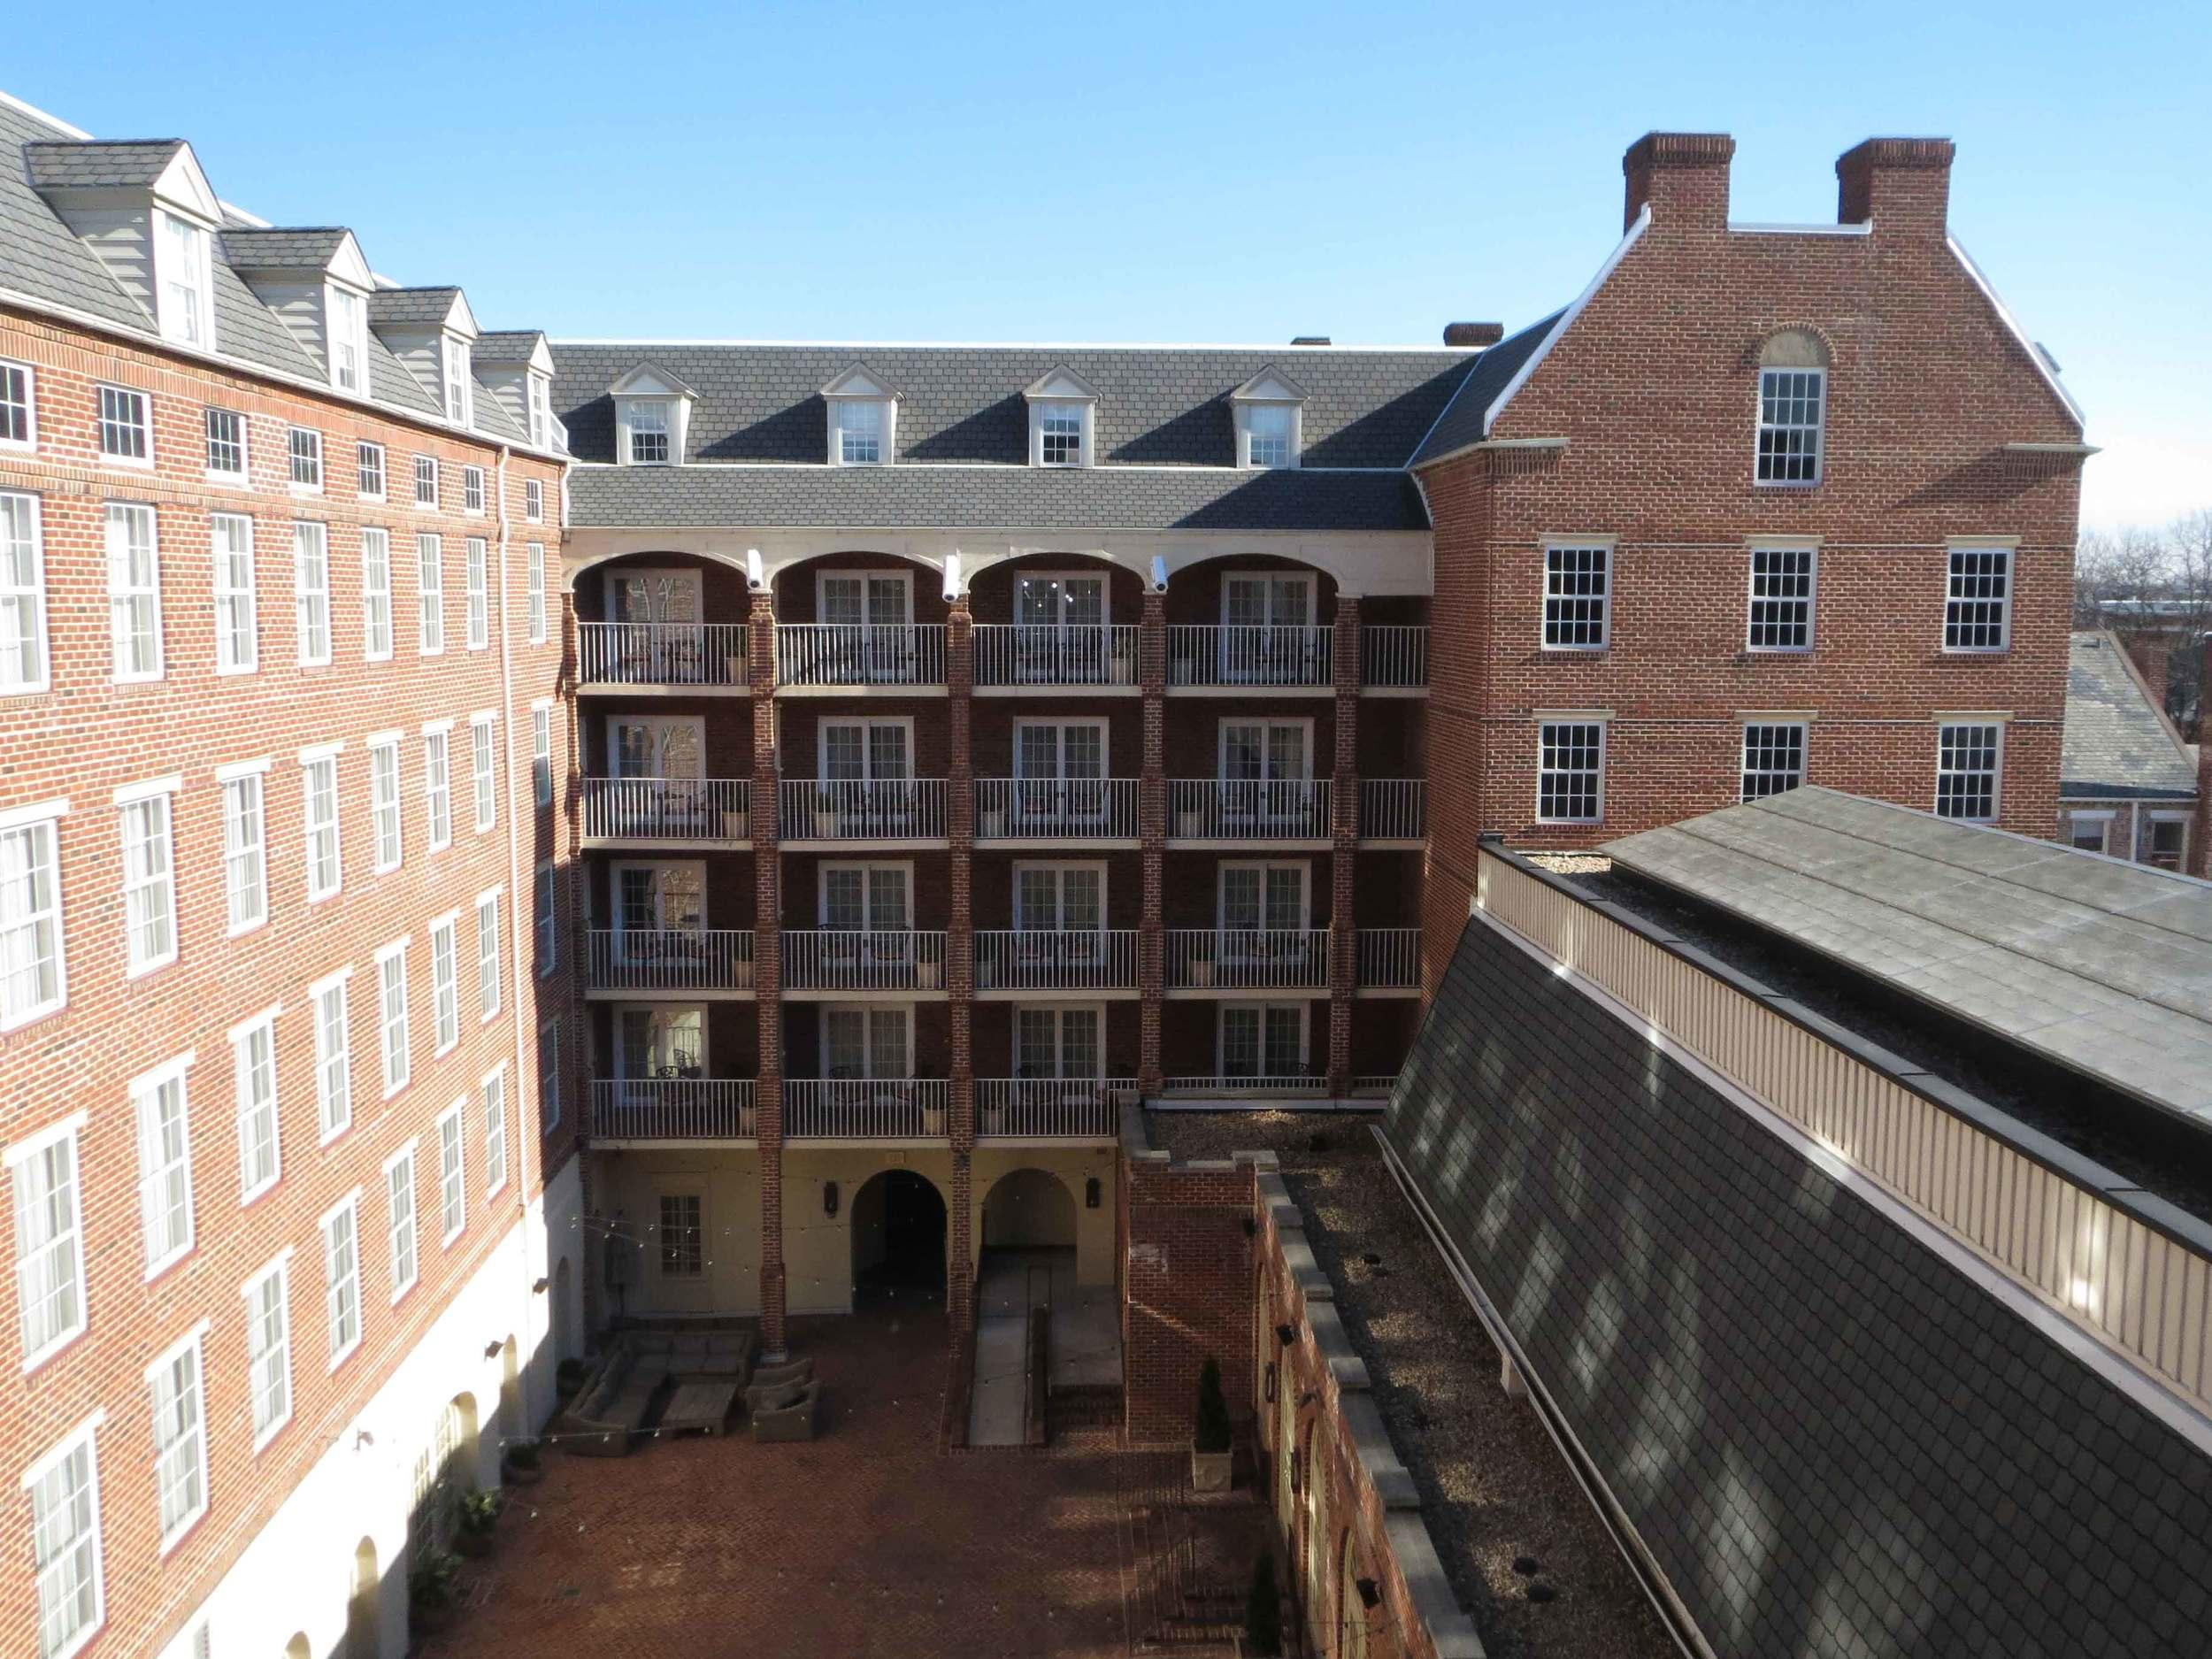 hotel-monaco-alexandria-virginia-kline-engineering-post-tension-concrete-structure-evaluation-and-restoration.jpg